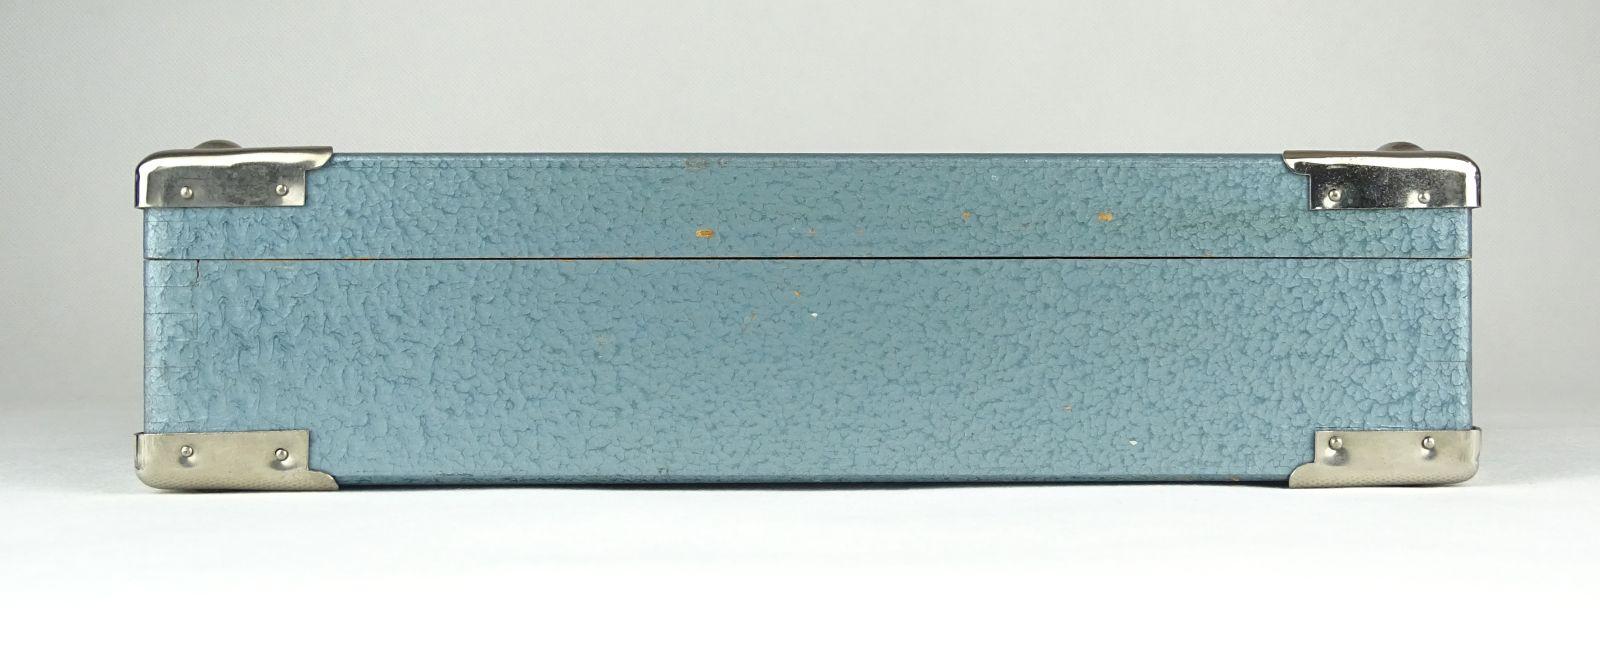 DSC03558.JPG (1600×659)